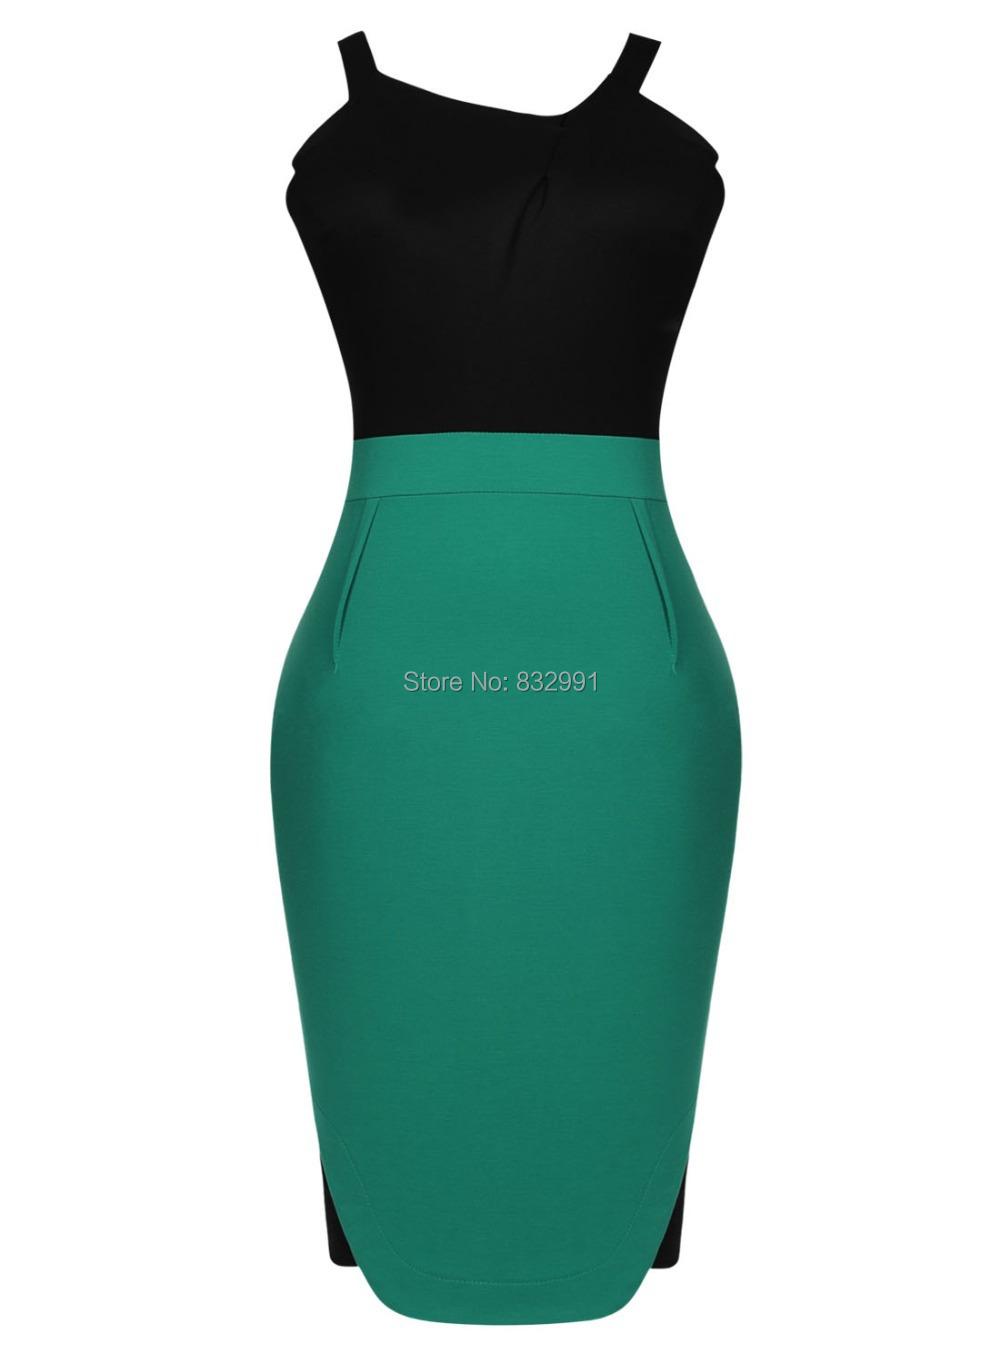 Party Dresses Hong Kong - Plus Size Tops